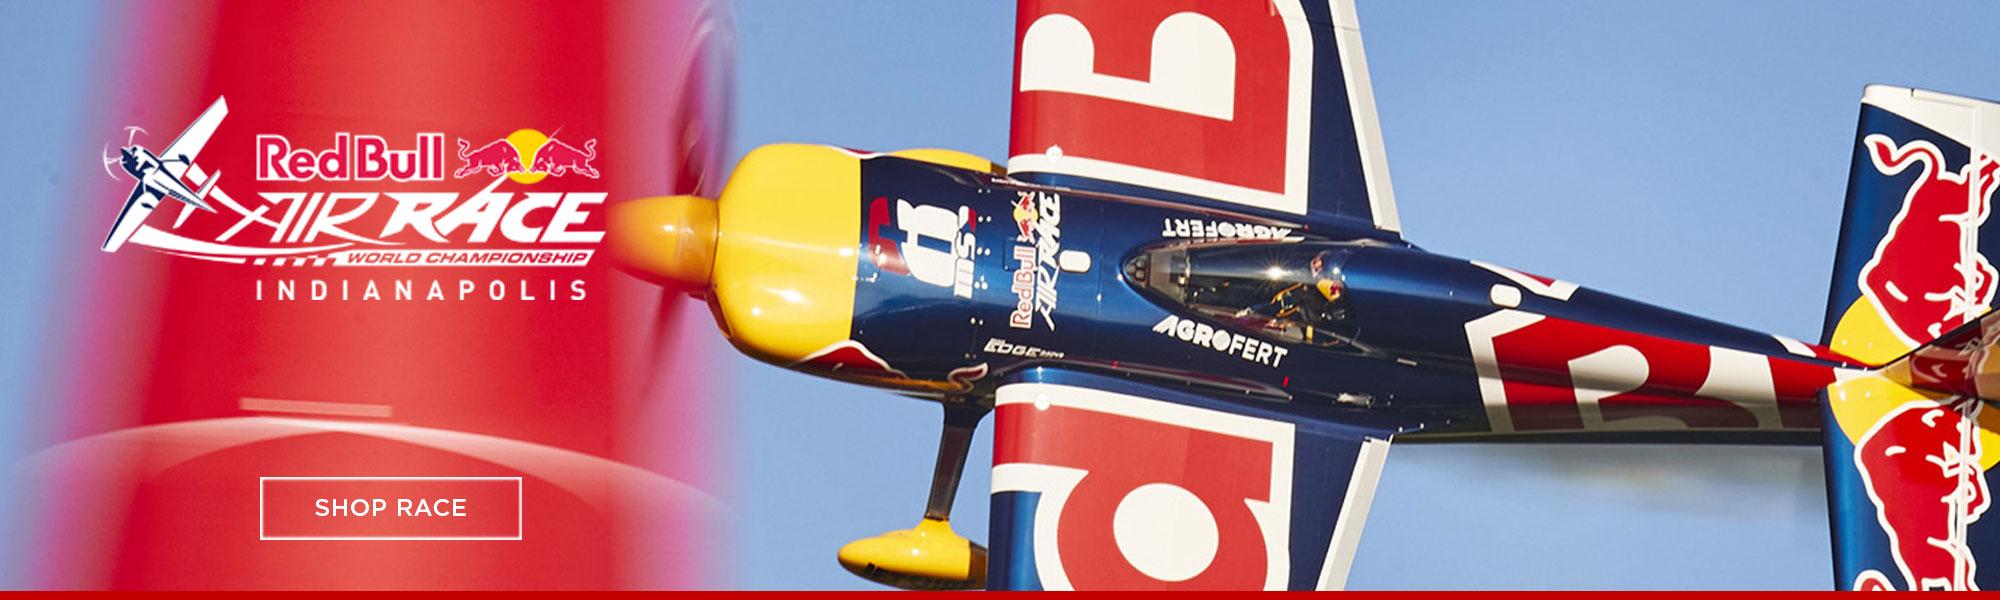 homepage-indycar-redbull-race.jpgg